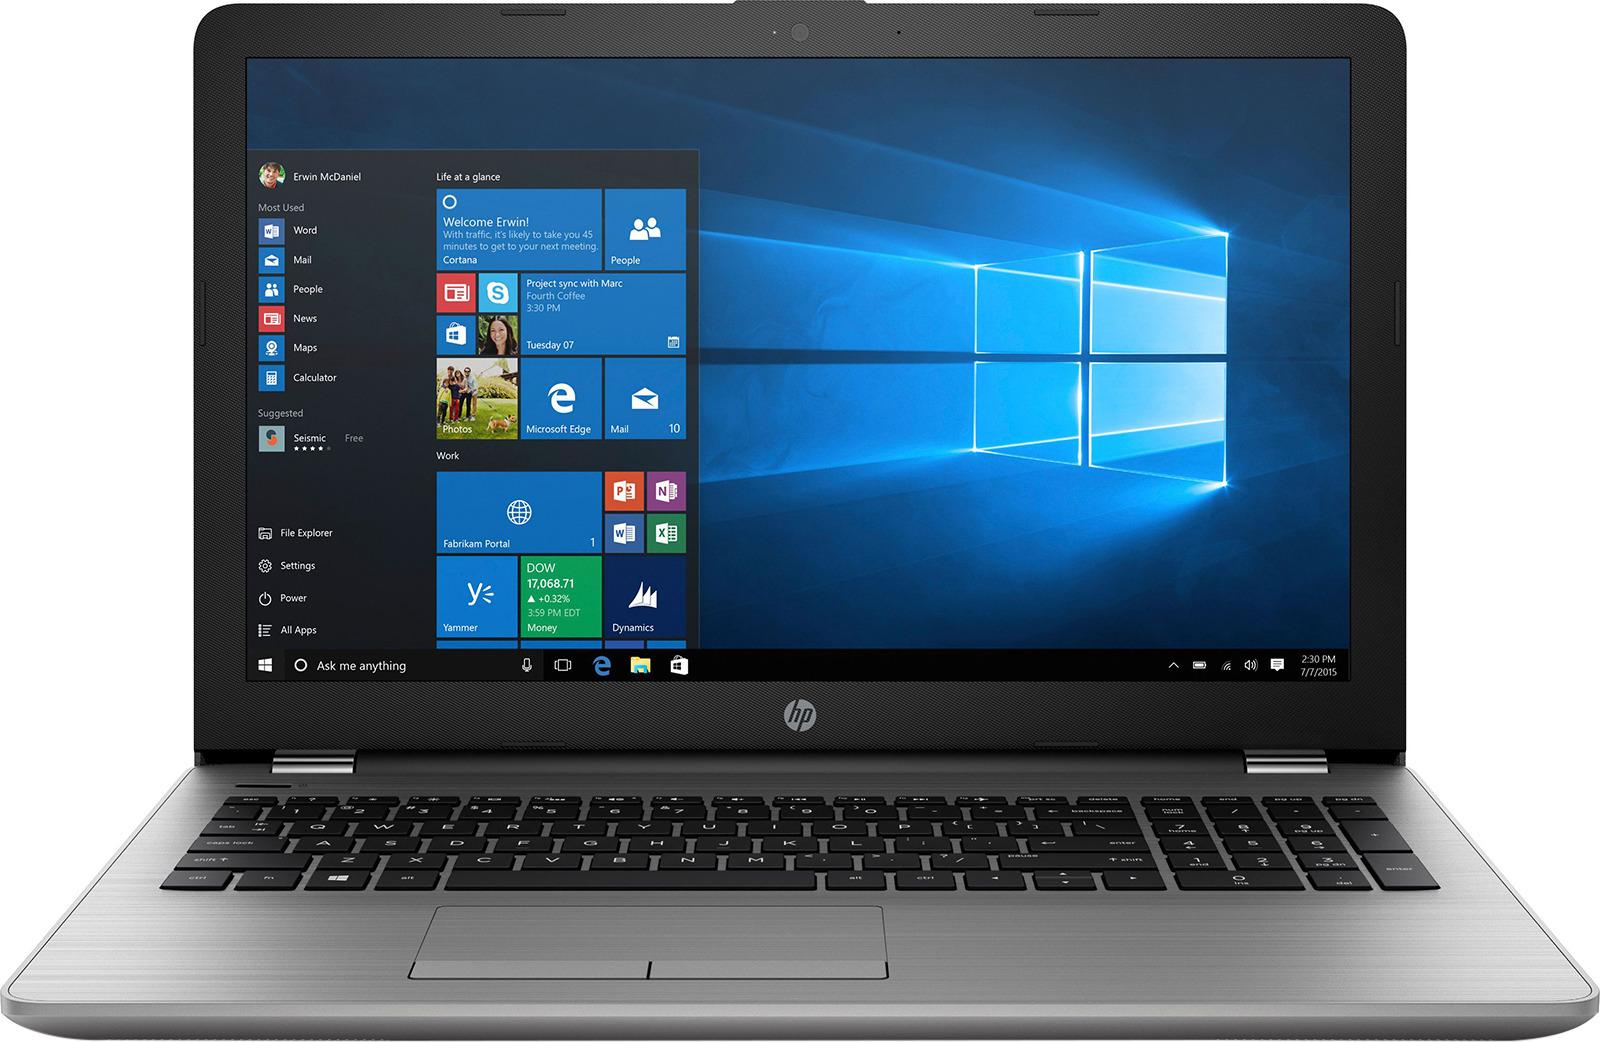 лучшая цена Ноутбук HP 250 G6 1XN69EA, серебристый